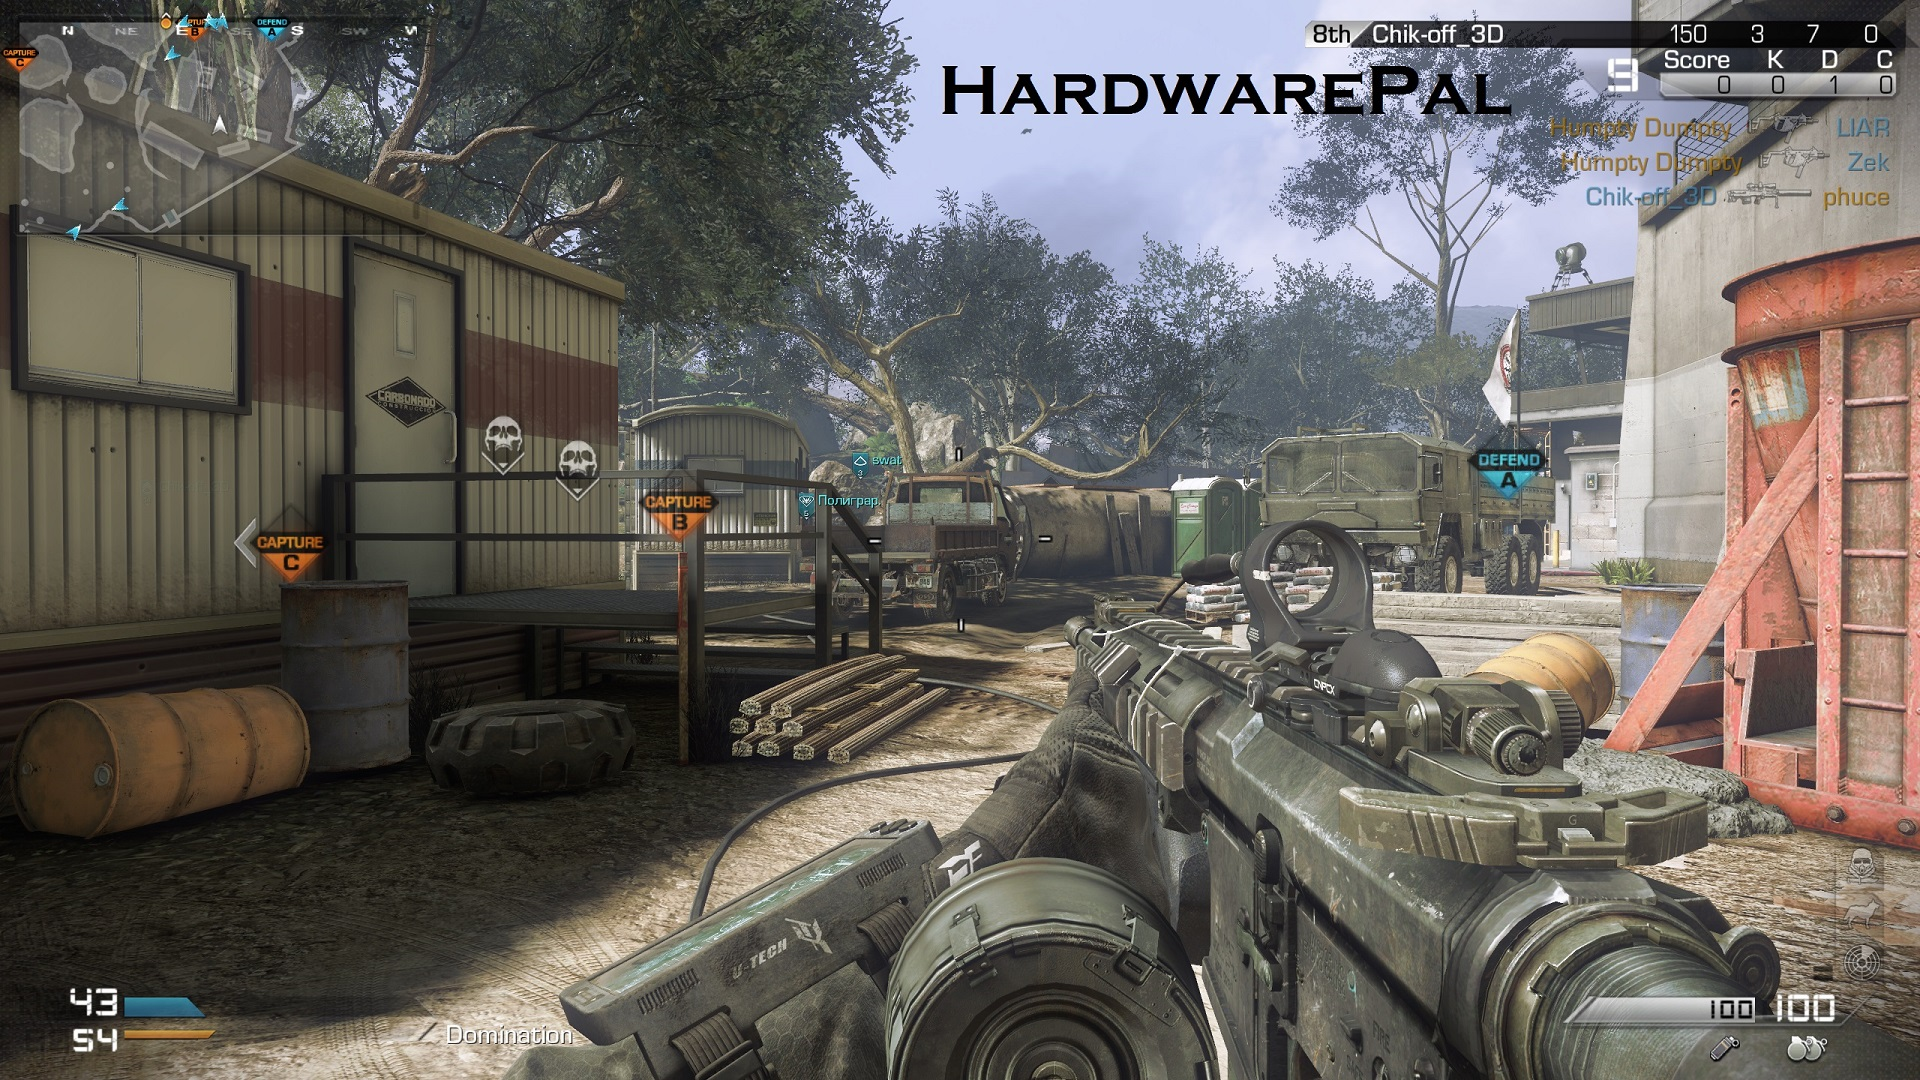 COD gameplay